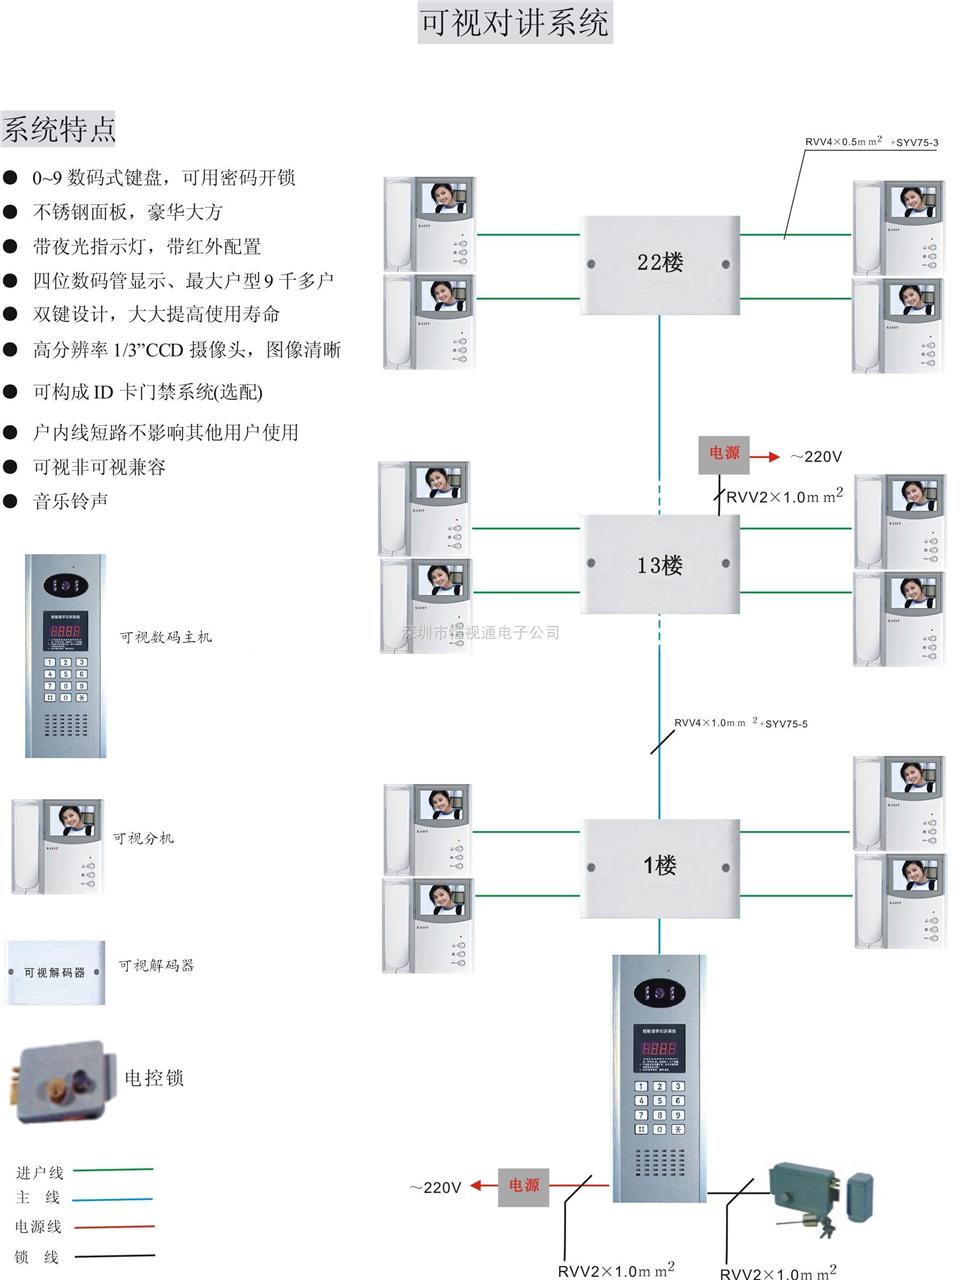 kaist-楼宇对讲系统黑白可视分机布线图-深圳市恺